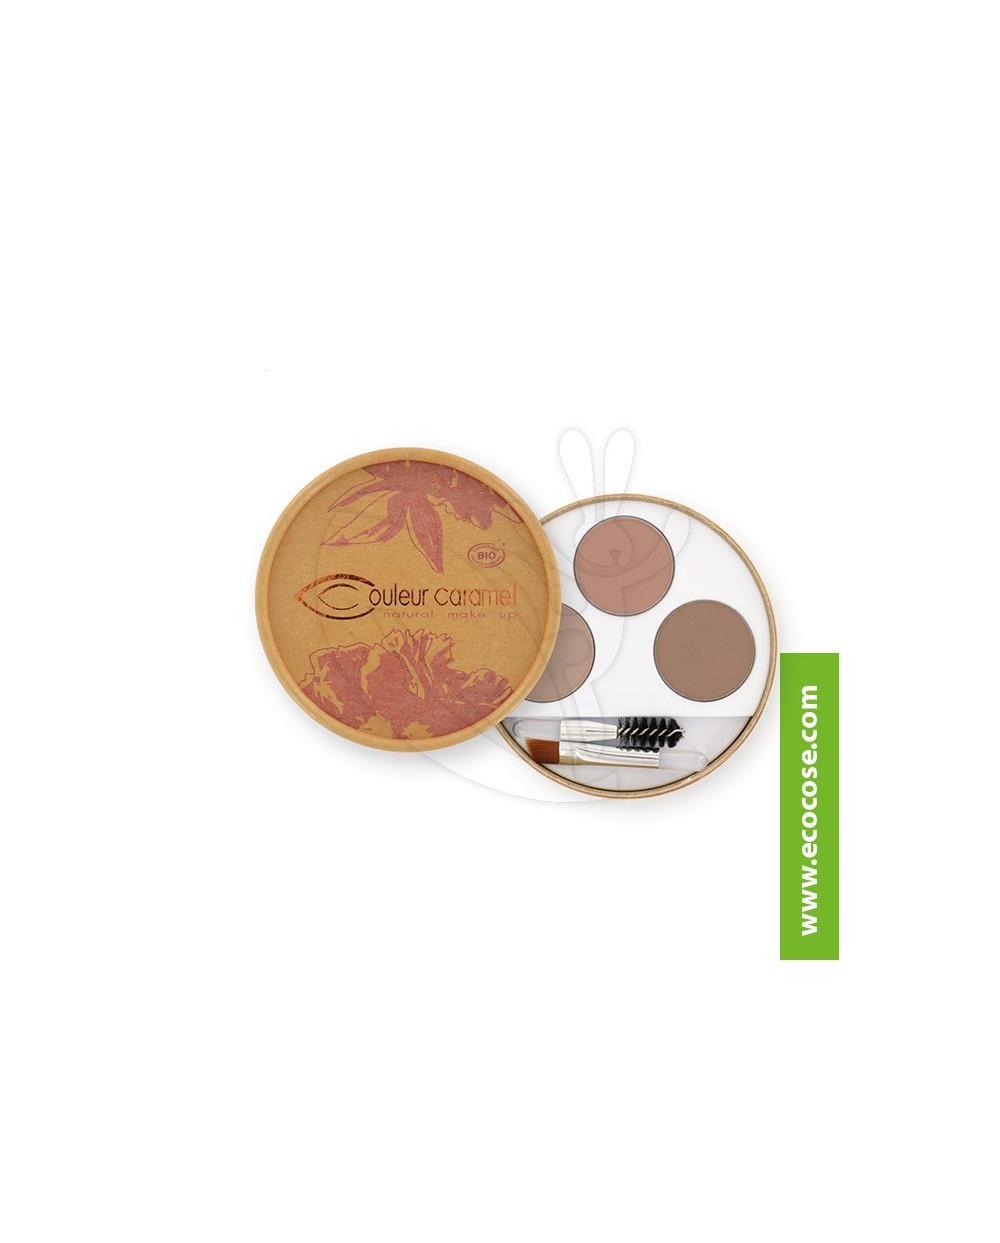 Couleur Caramel - Kit sopracciglia bionde 928